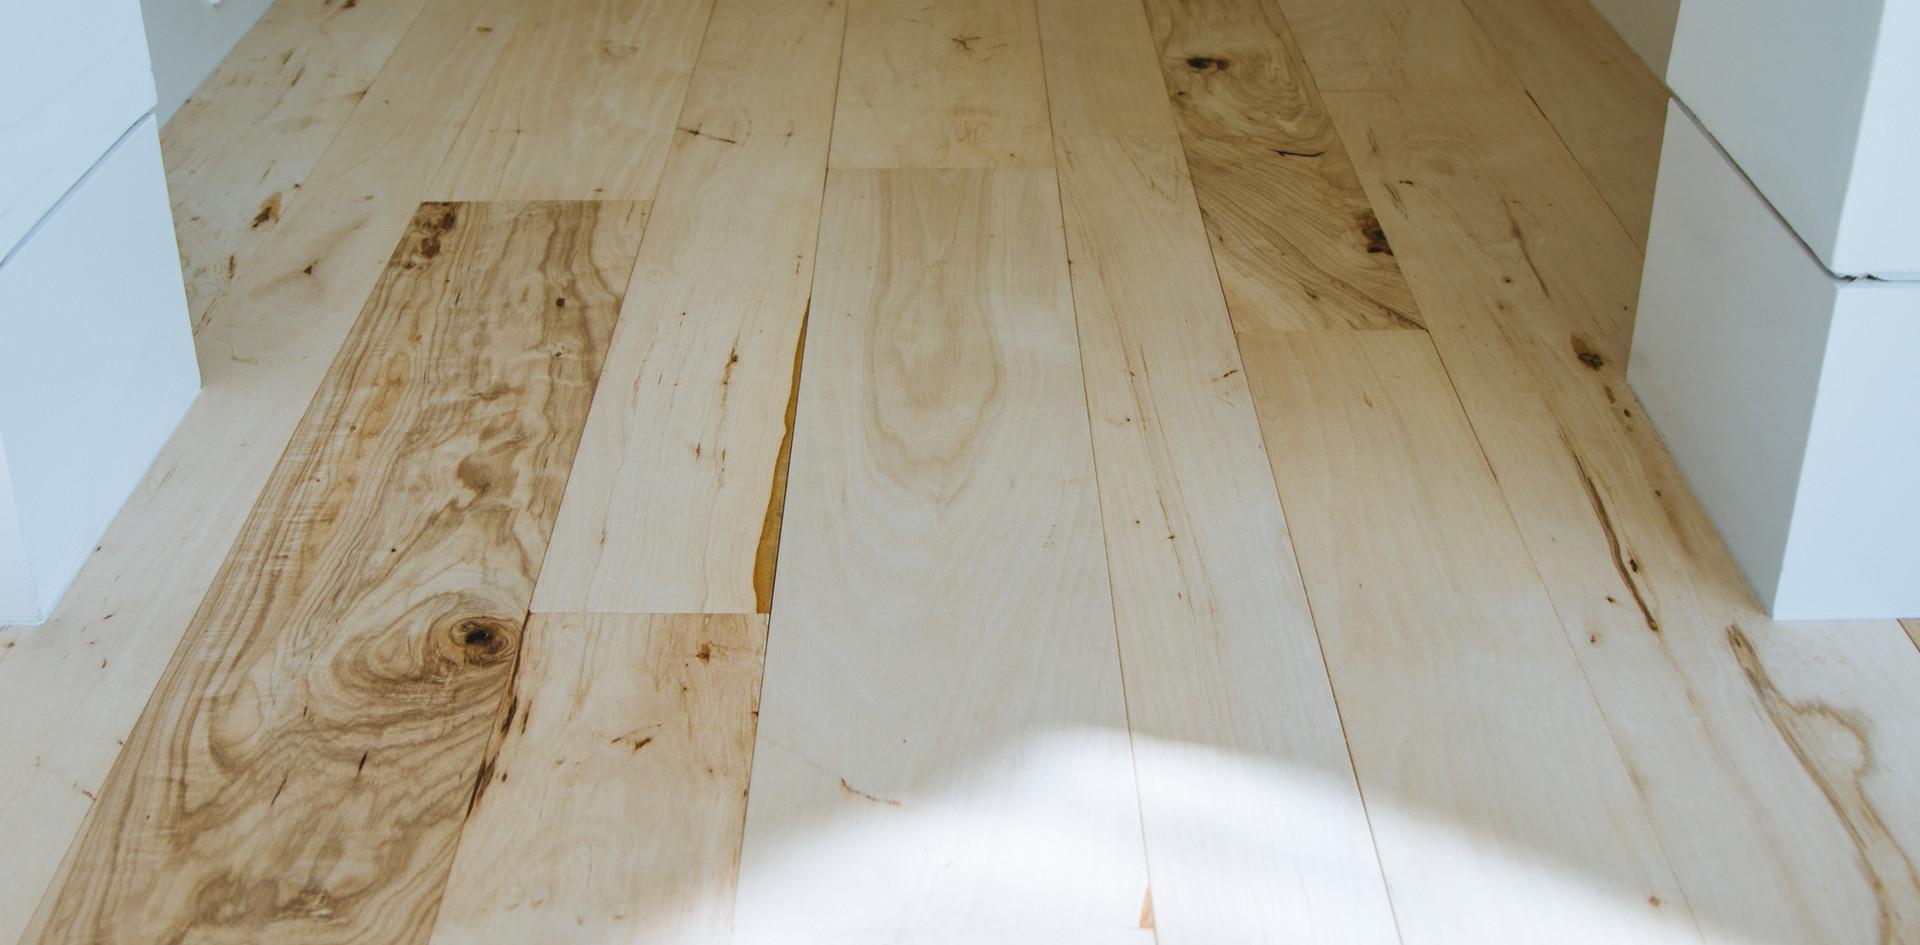 Bleached Southern Pecan Hardwood Flooring